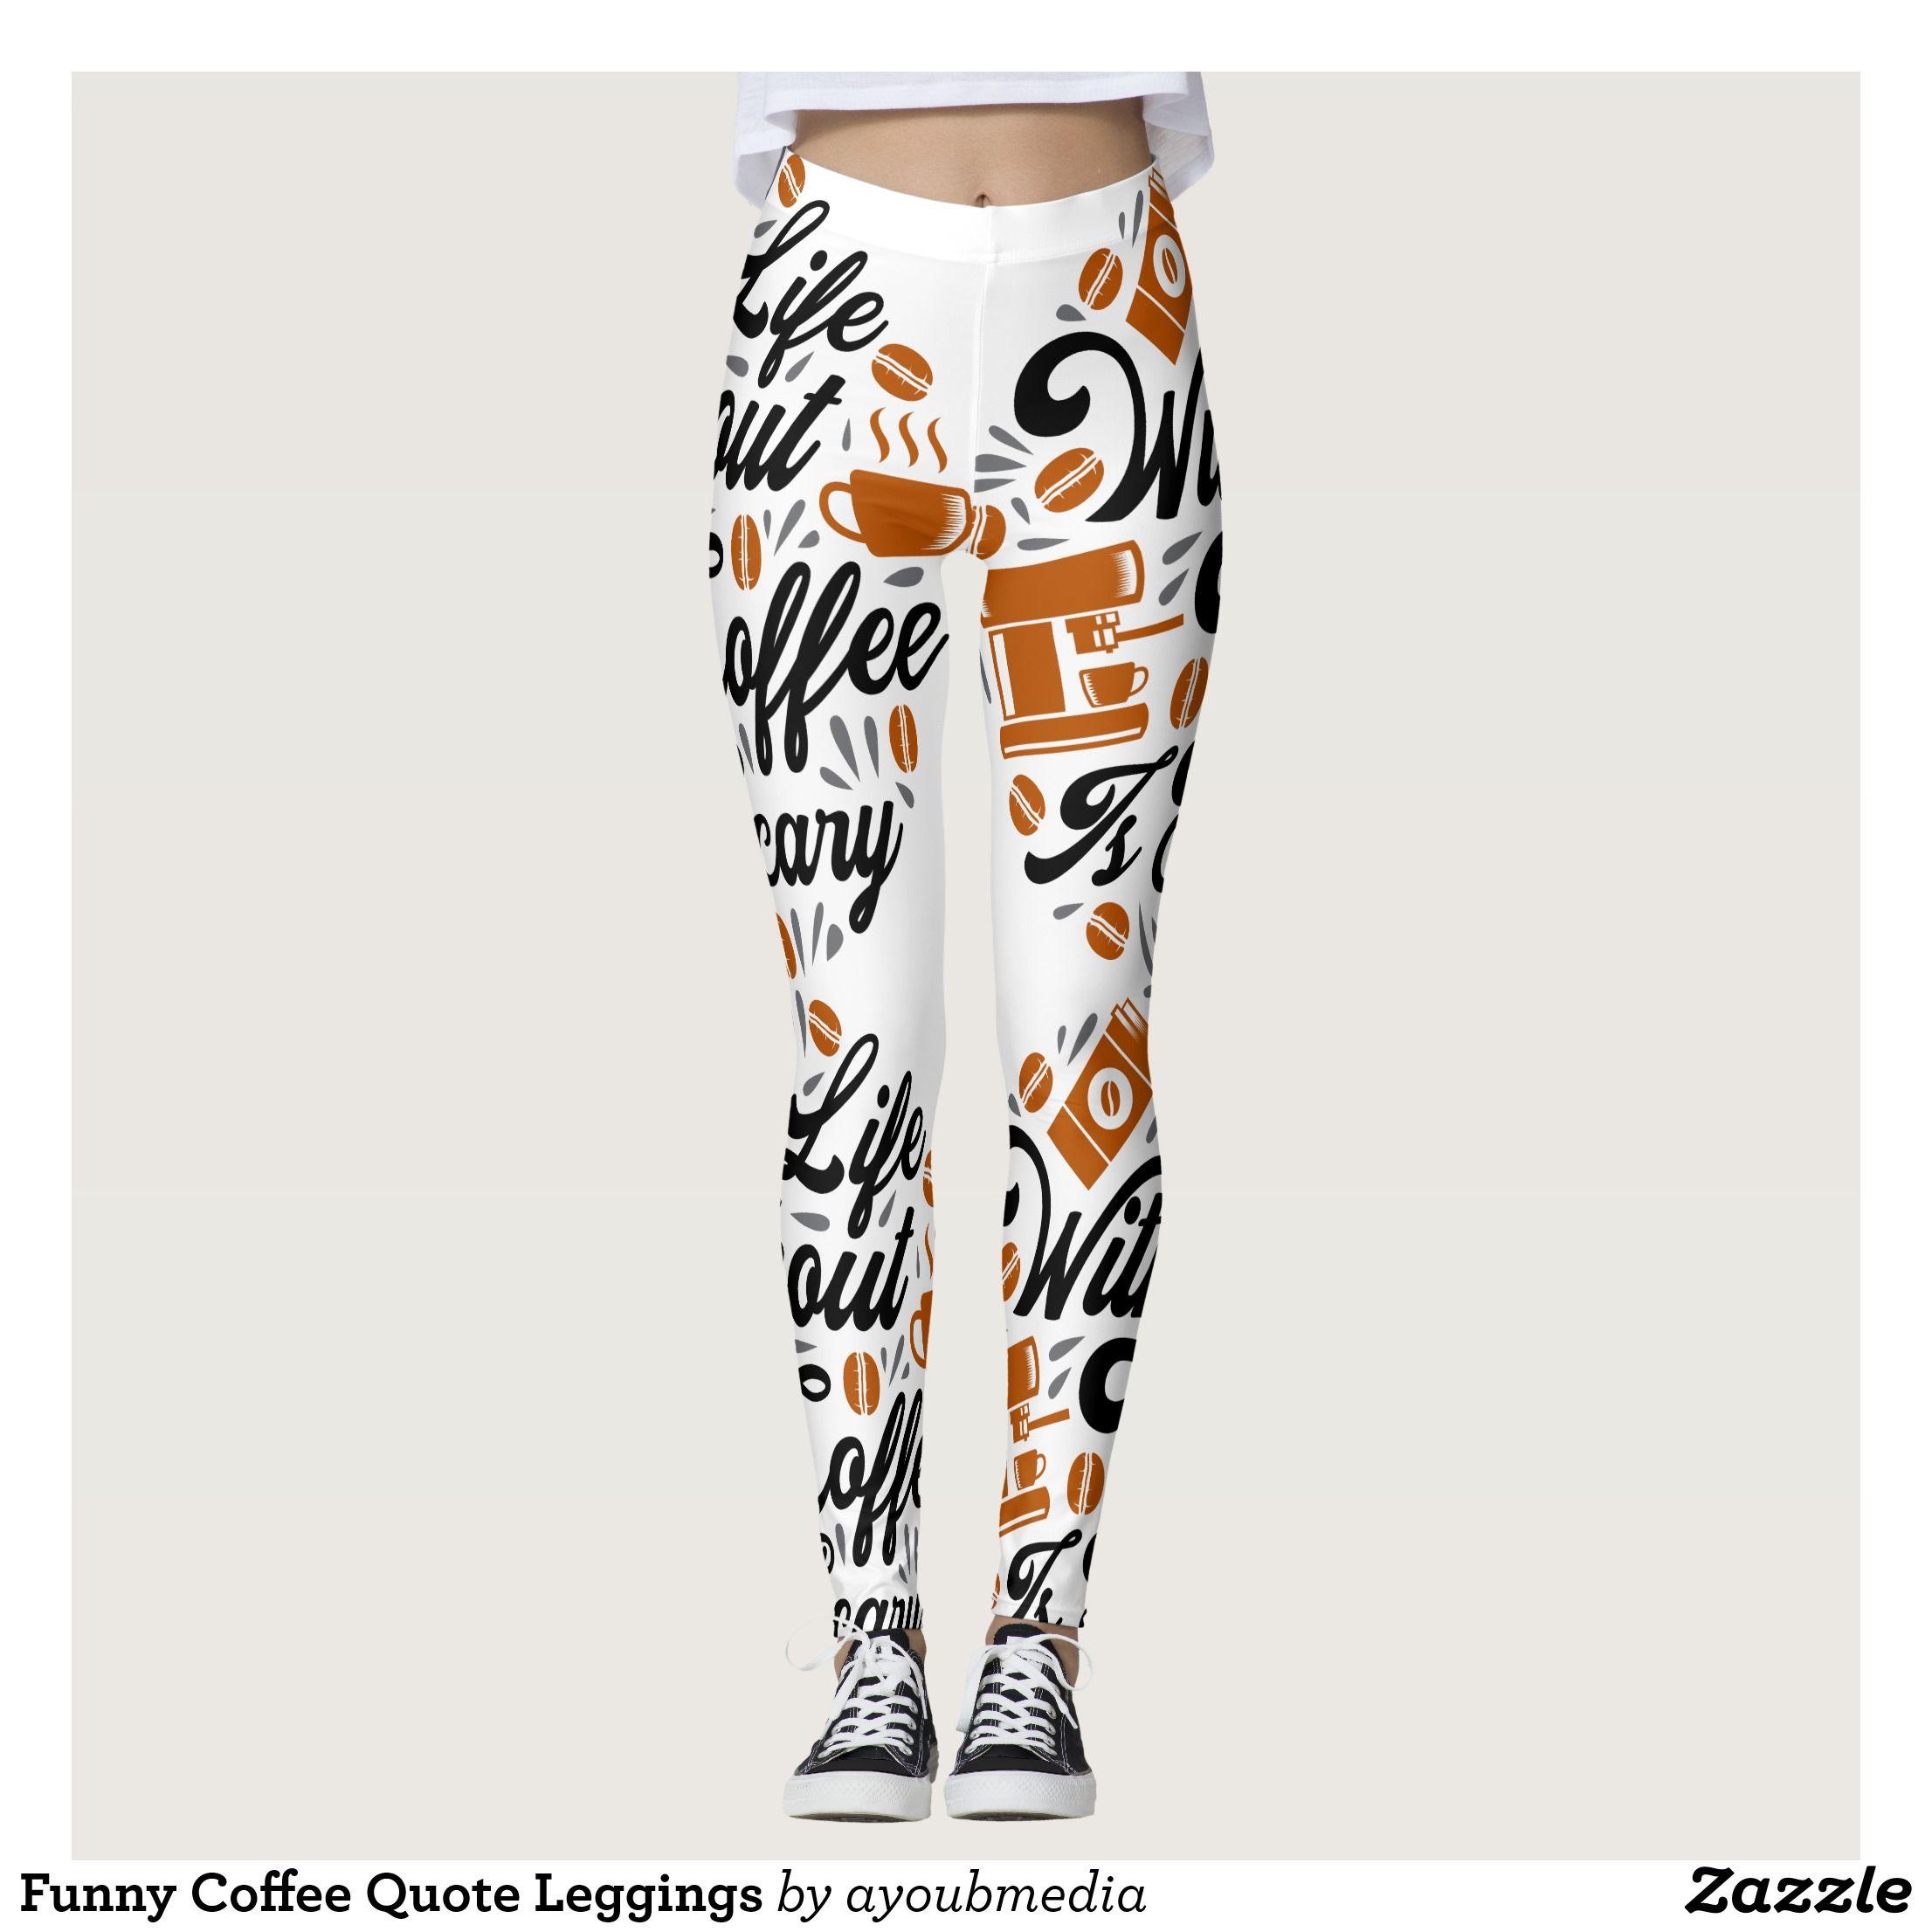 Funny Coffee Quote Leggings Leggings funny